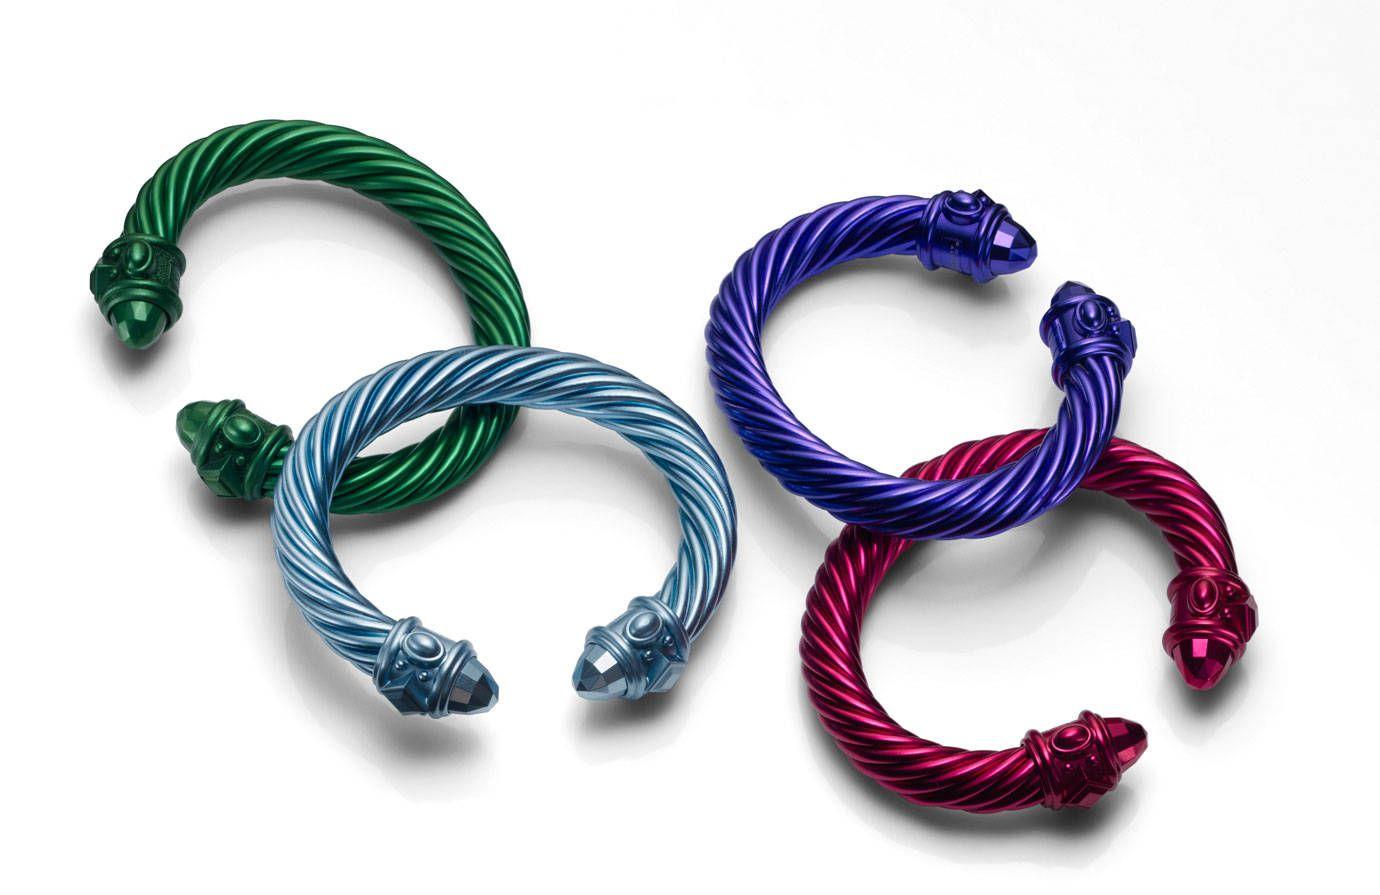 David Yurman bracelets, in stores in February 2014.